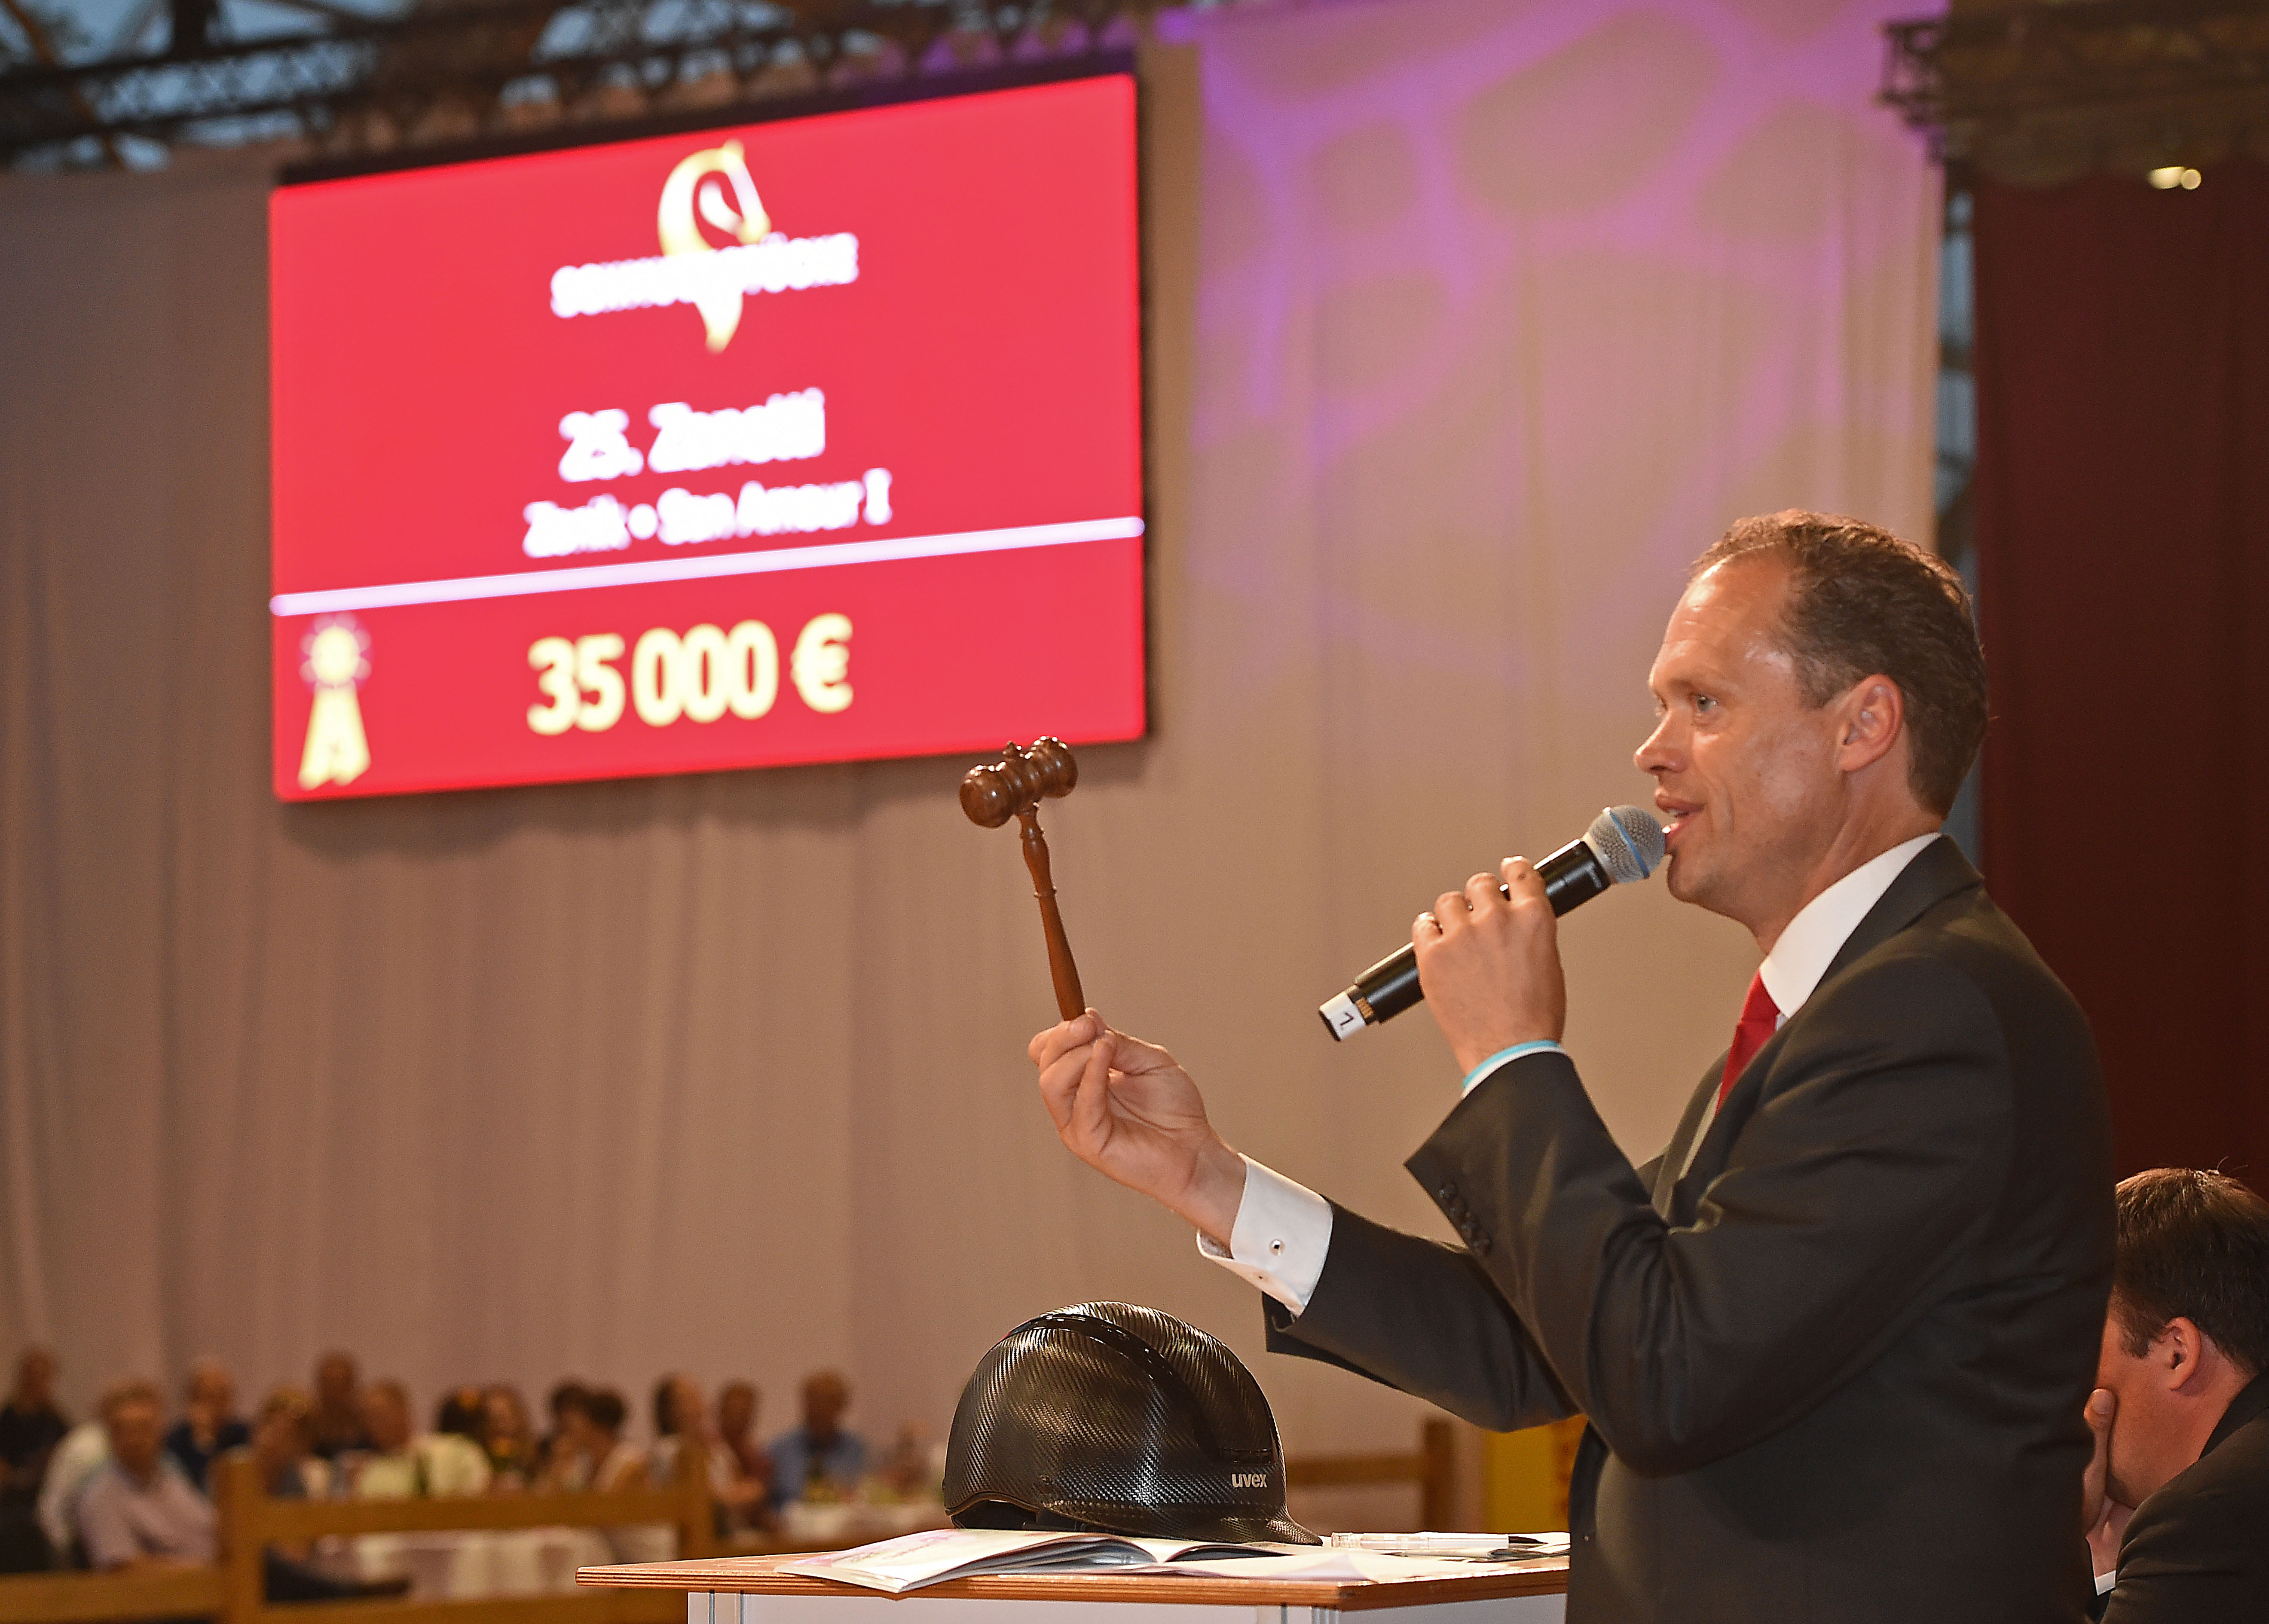 Schmuckstücke 2017: Zanetti ist das teuerste Schmuckstück - 27. Mai ...